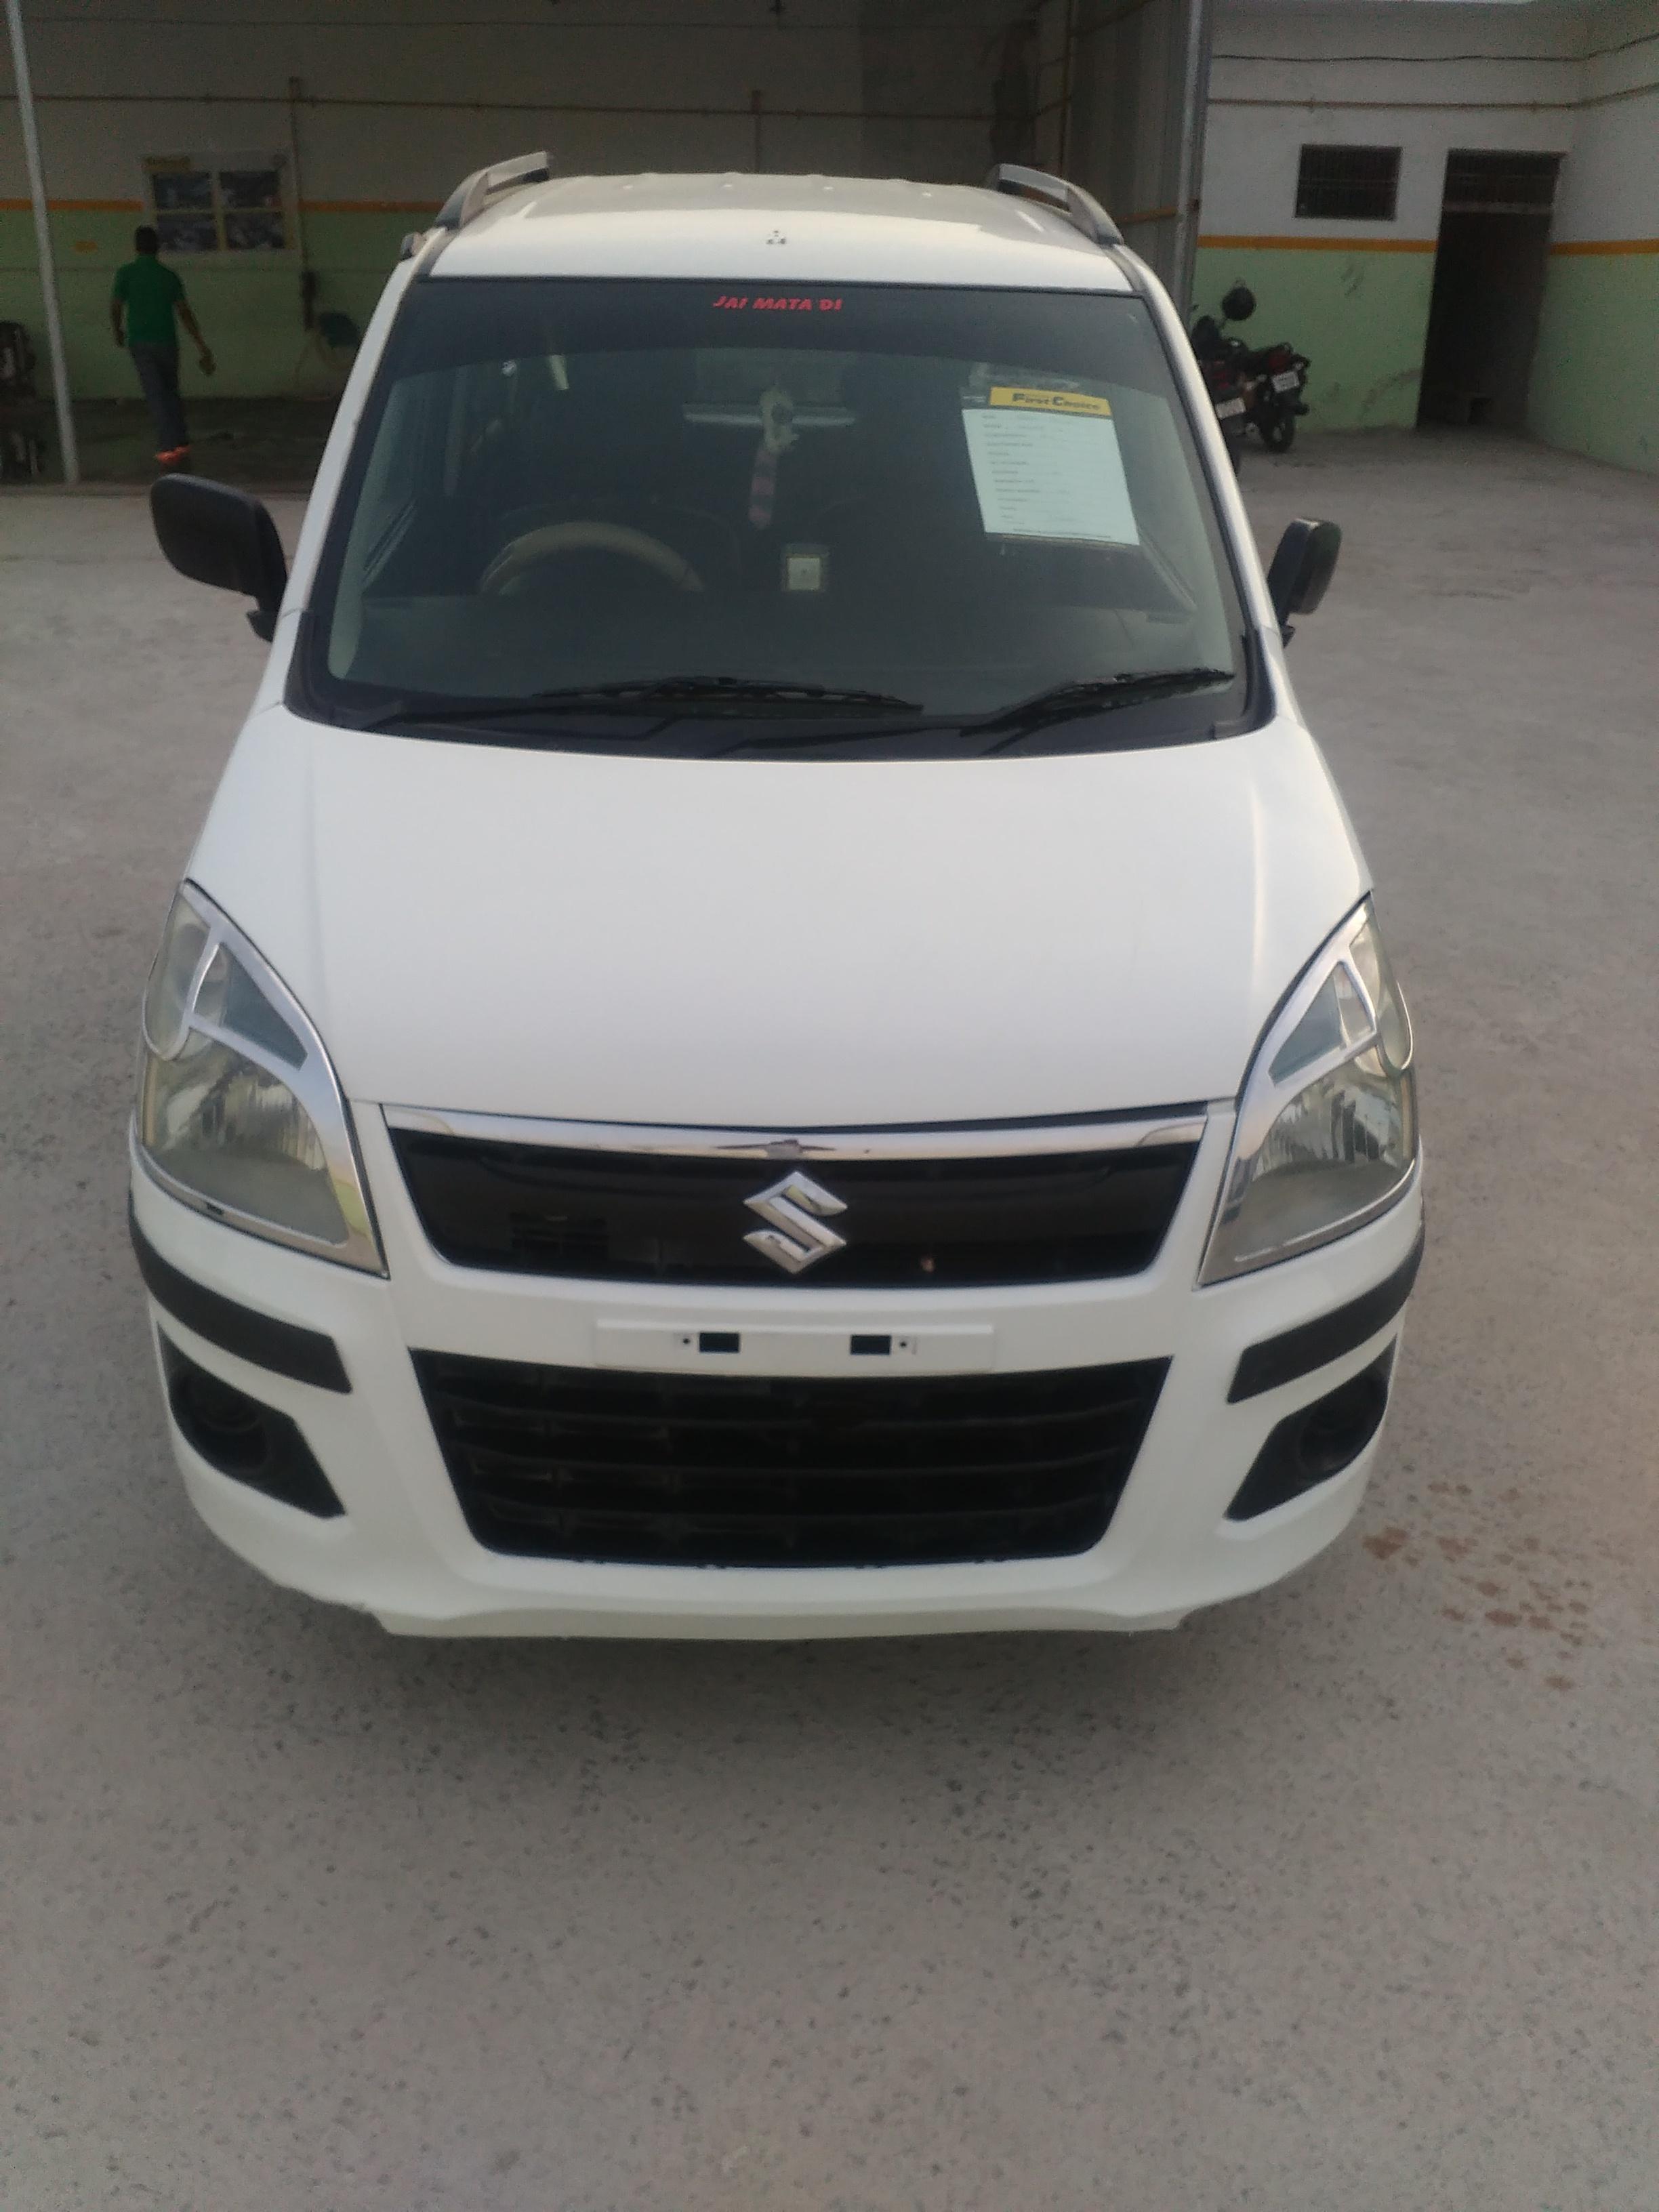 2016 Used Maruti Suzuki Wagon R 1.0 LXI